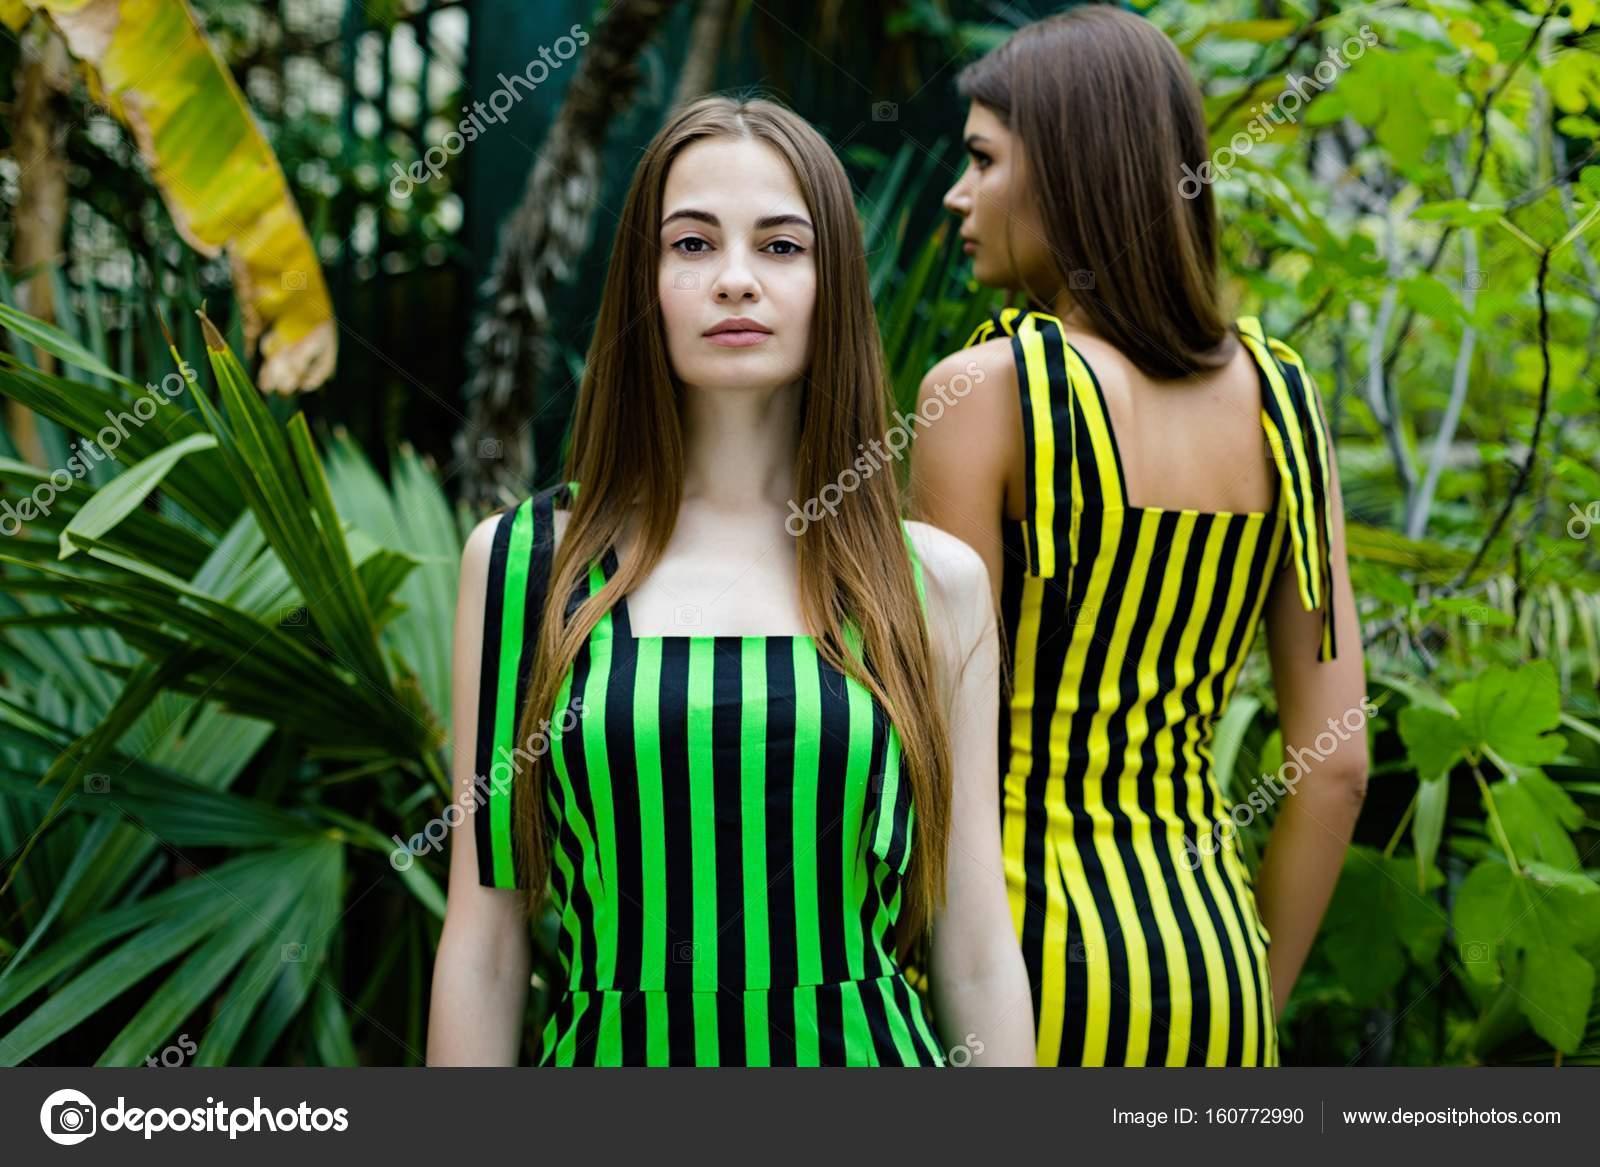 23095aefd42 Δύο νέοι όμορφες γυναίκες στον κομψό ριγέ φορέματα θέτοντας σε εξωτερικούς  χώρους — Εικόνα από smmartynenko